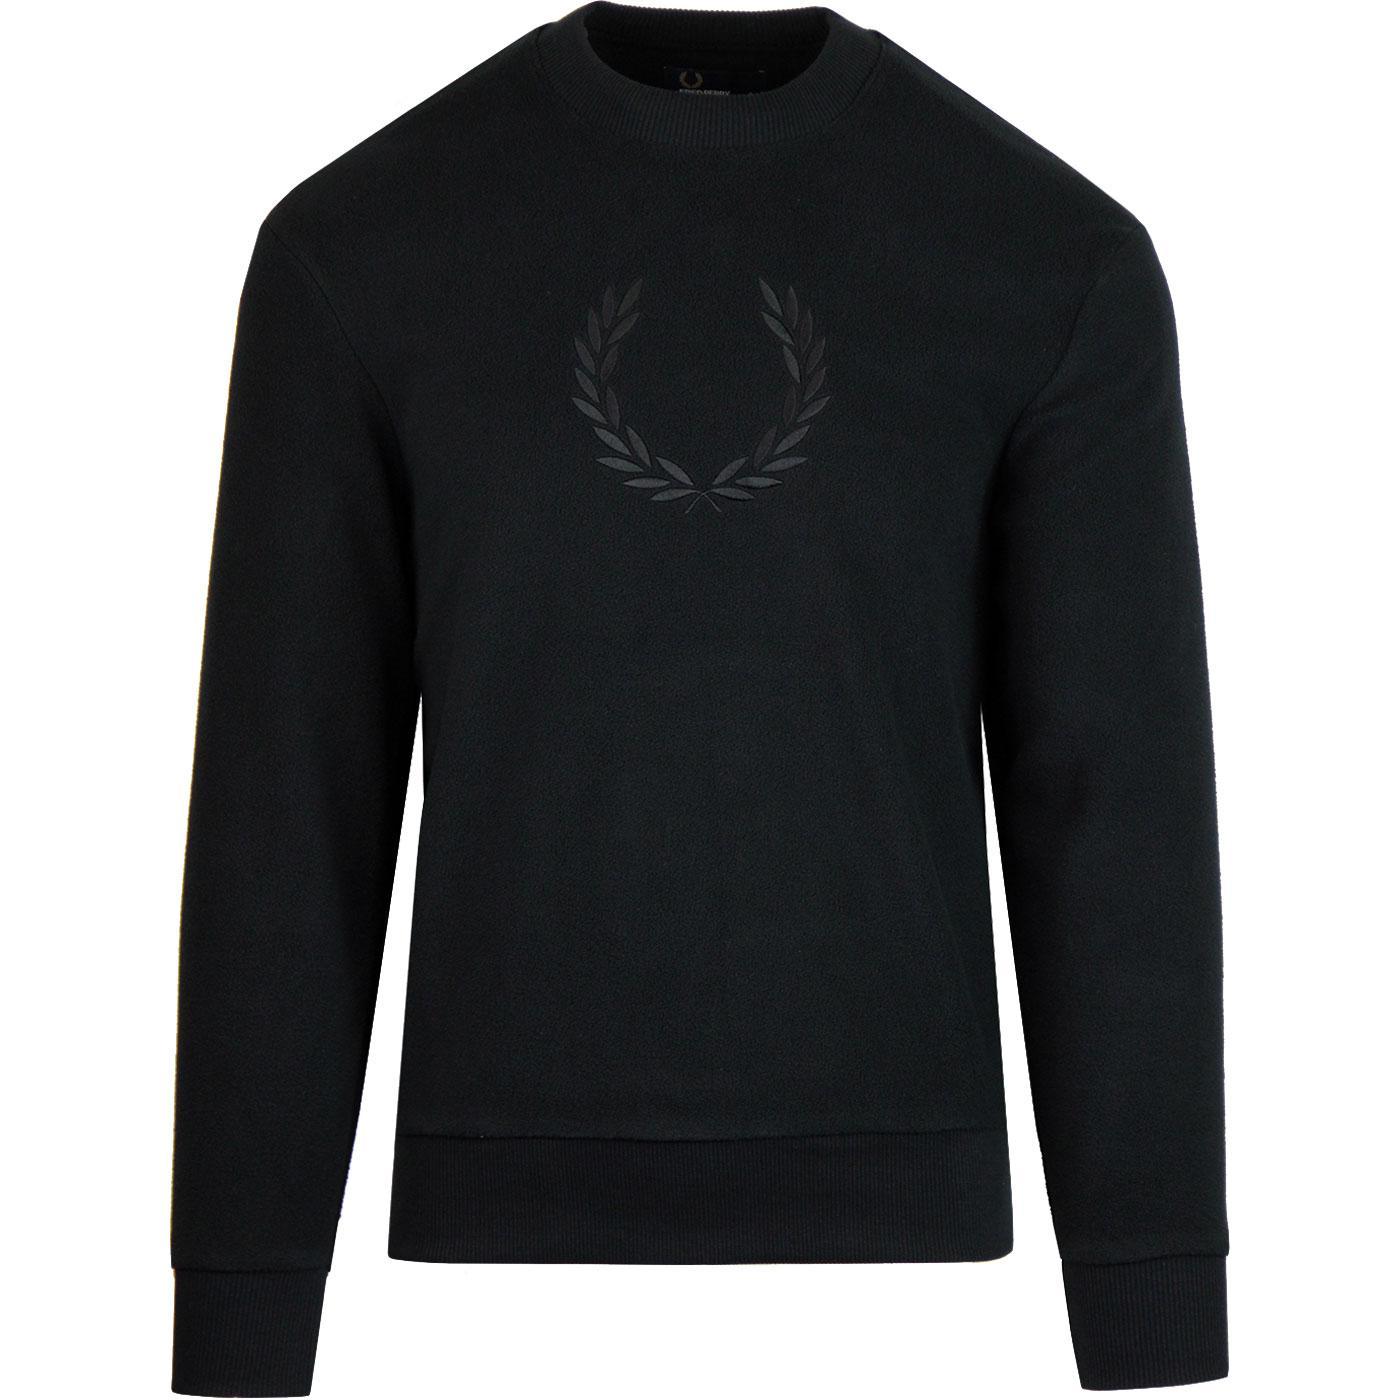 FRED PERRY Men's Retro Fleece Sweatshirt (Black)